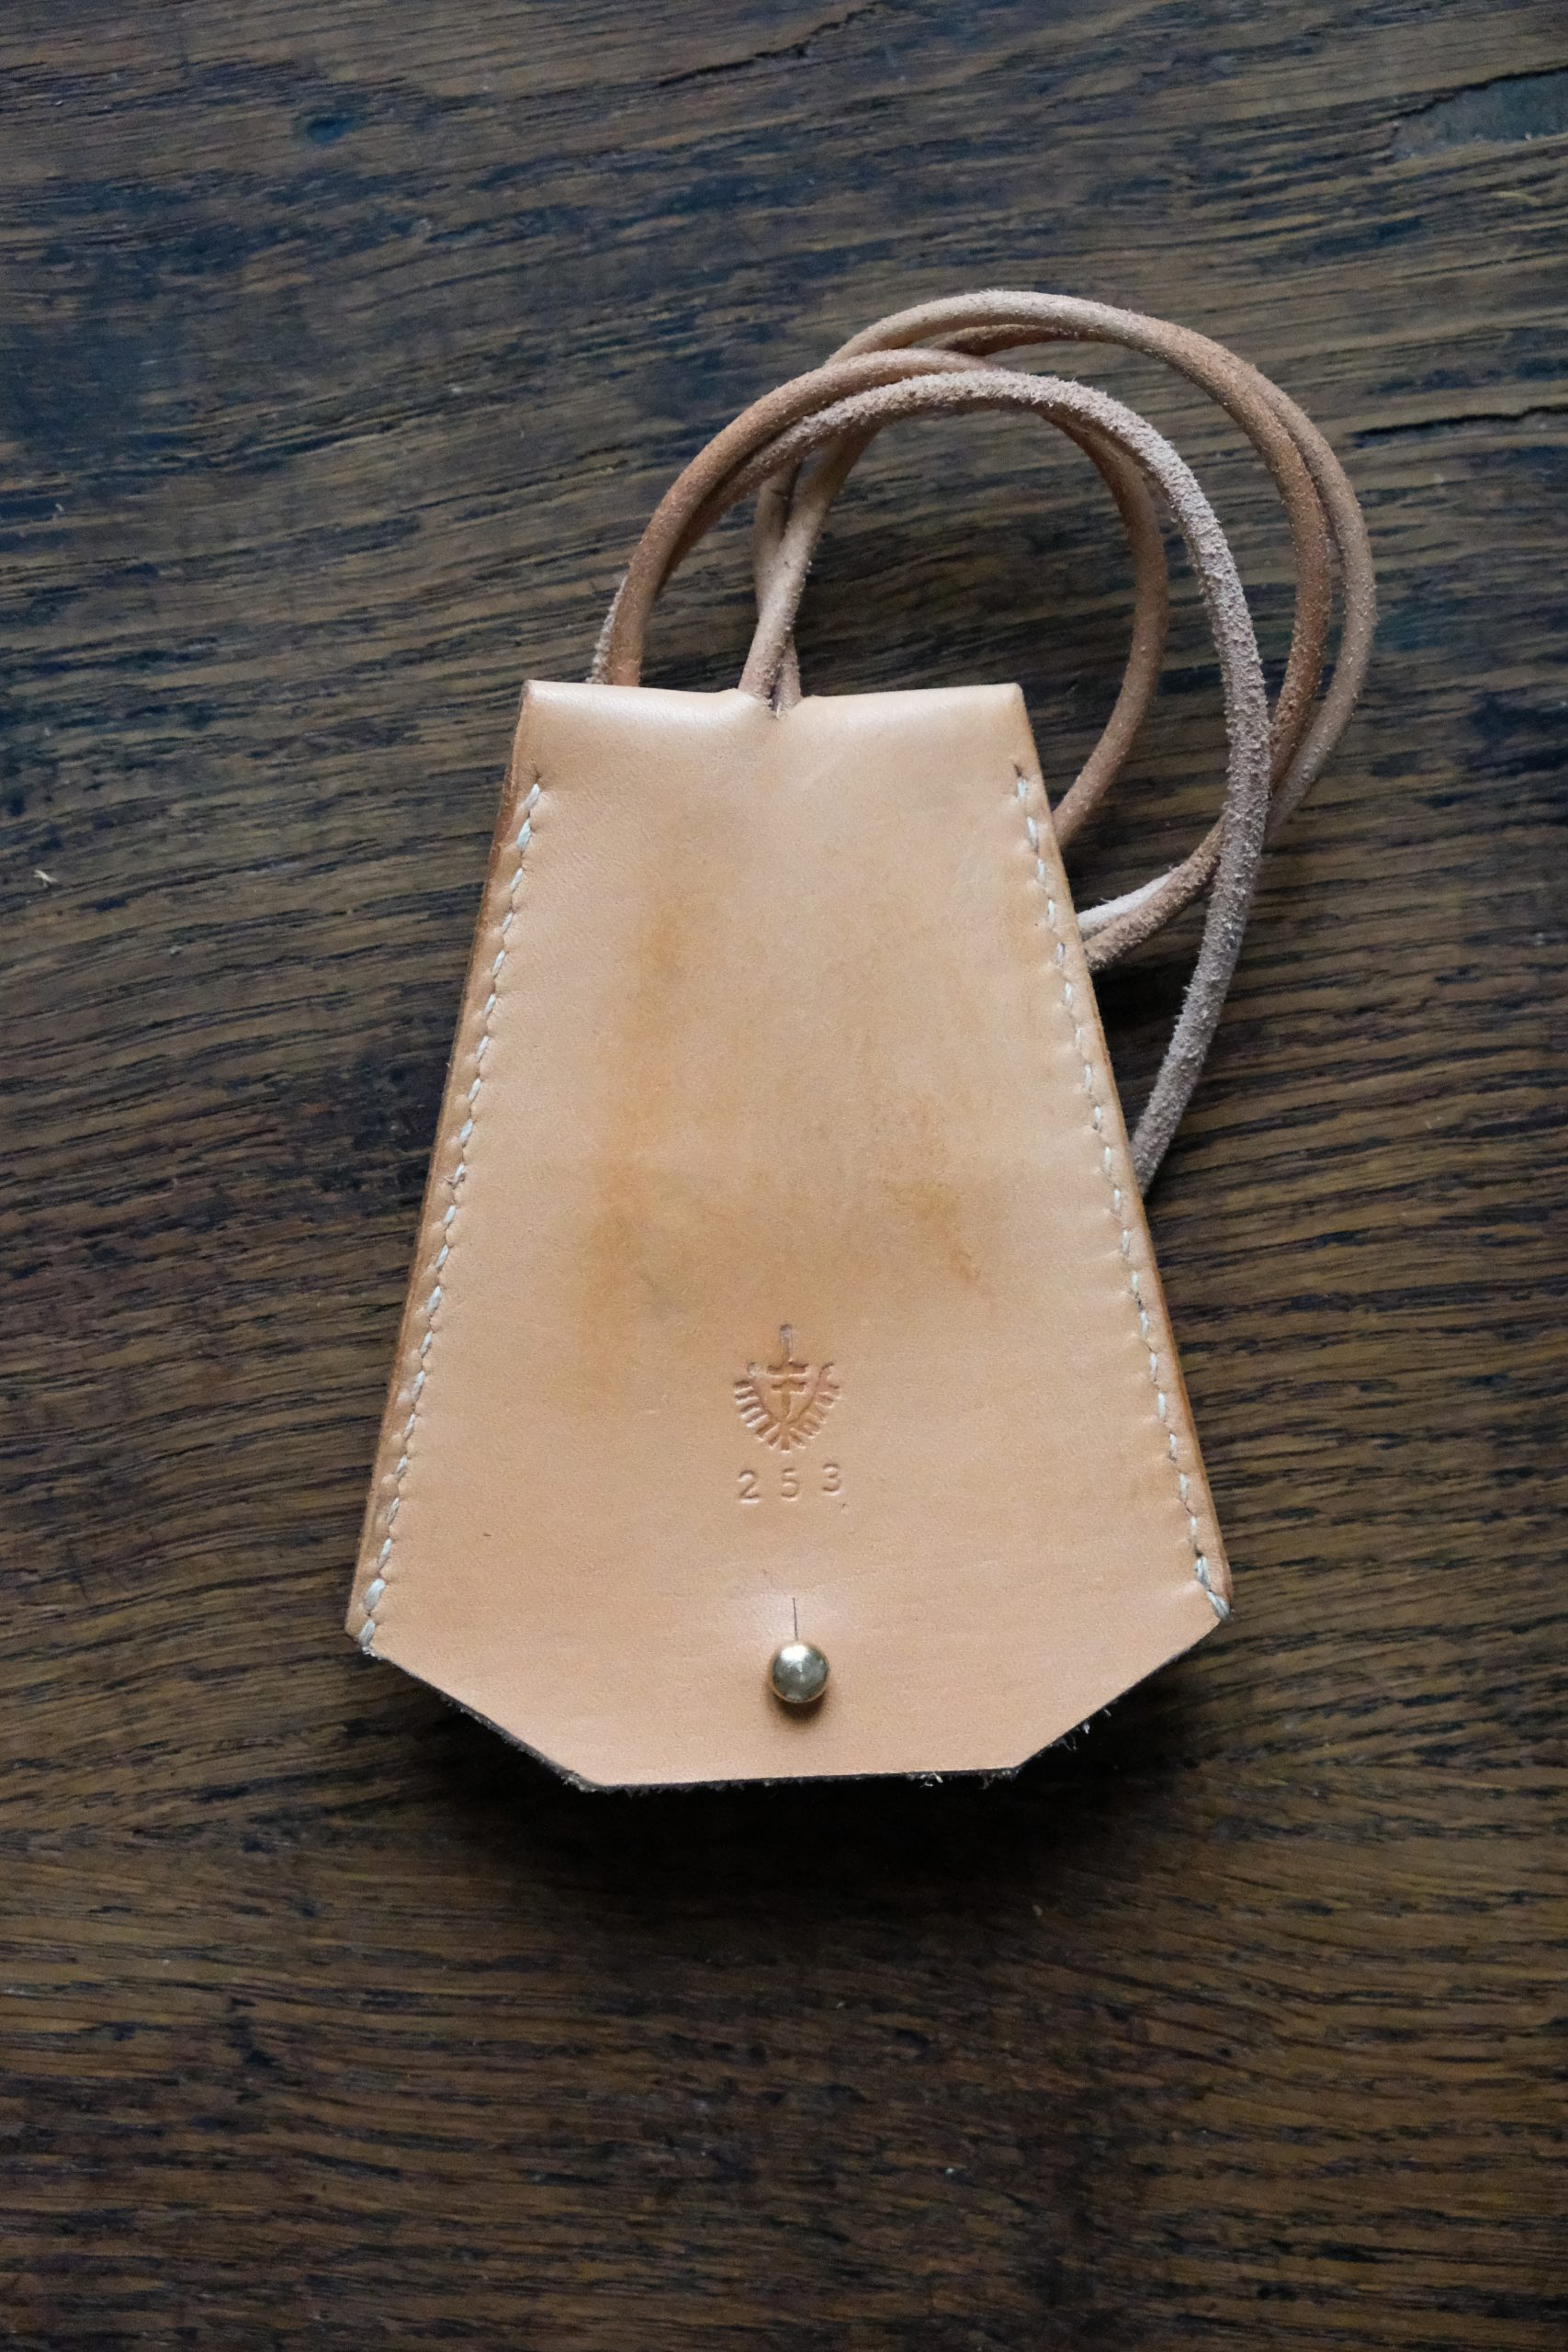 Lerif Designs leather bell key holder natural demo on wood background